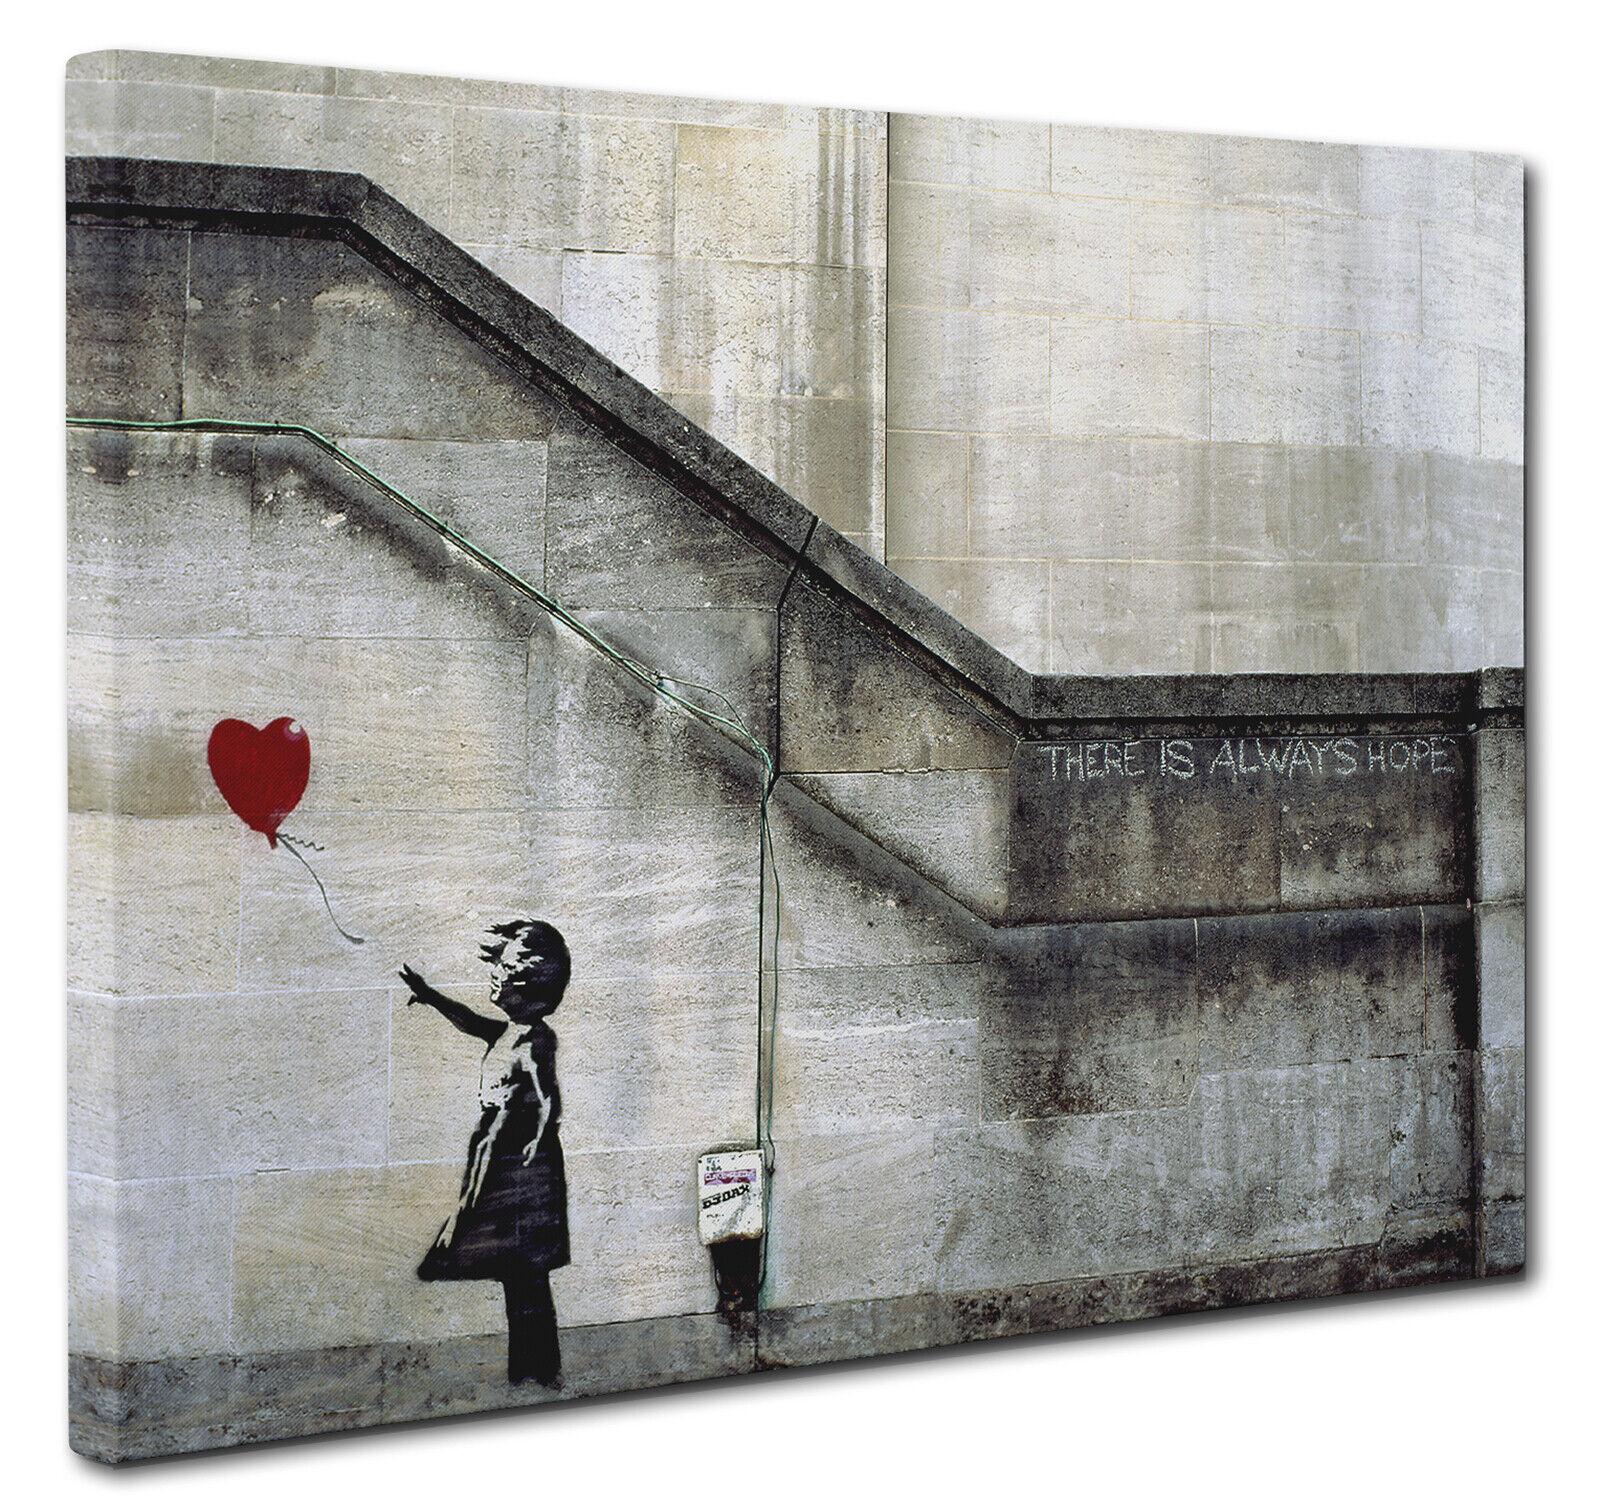 Canvas Banksy British Bulldog Wall Art Print Large or Small Picture a1 a2 Grey